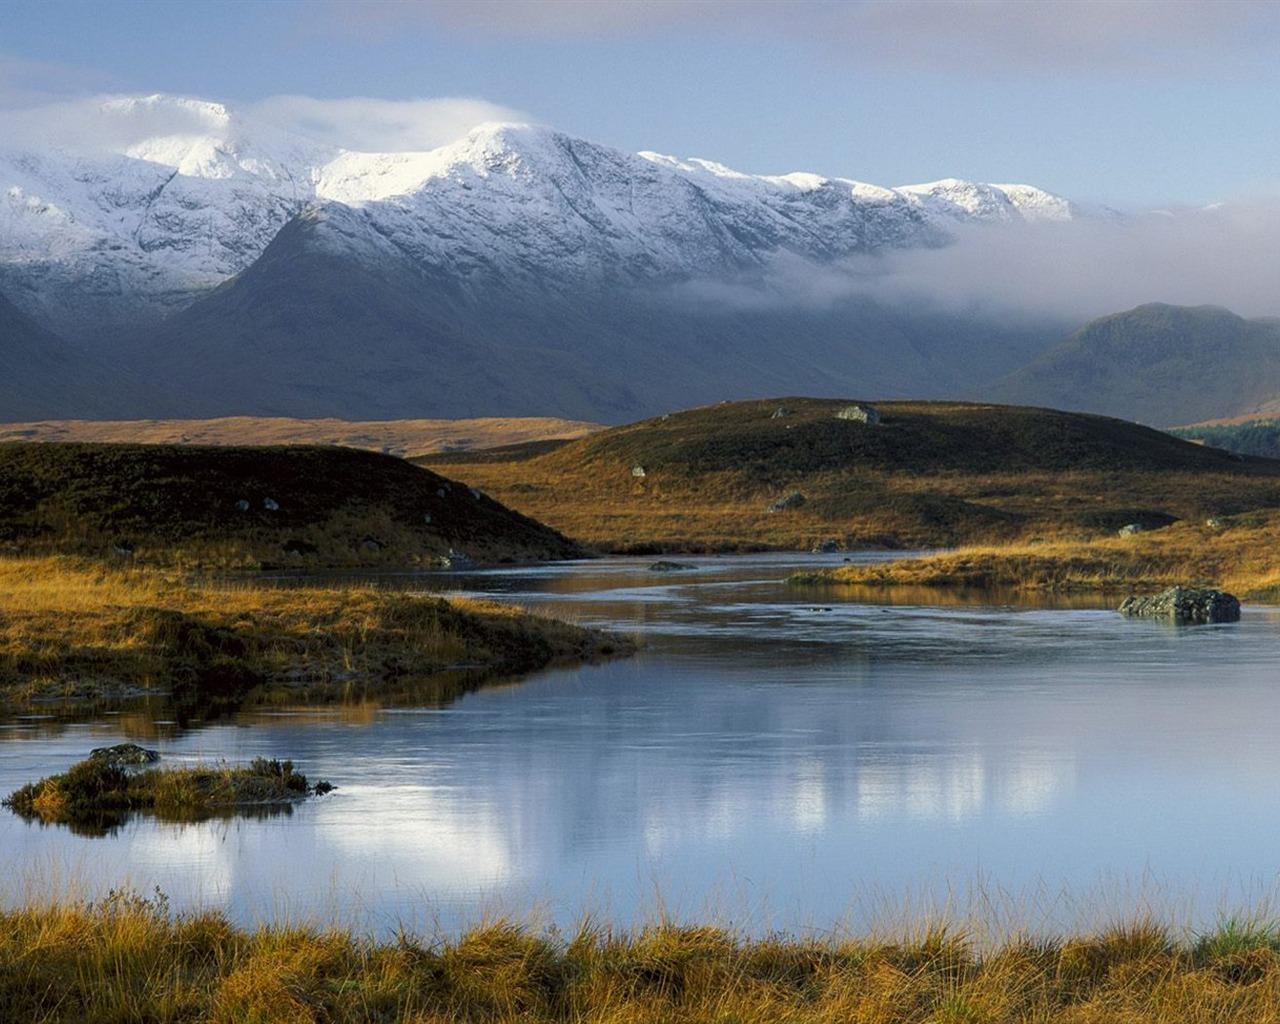 Highland lan nuoke marsh wallpaper preview - Highland park wallpaper ...